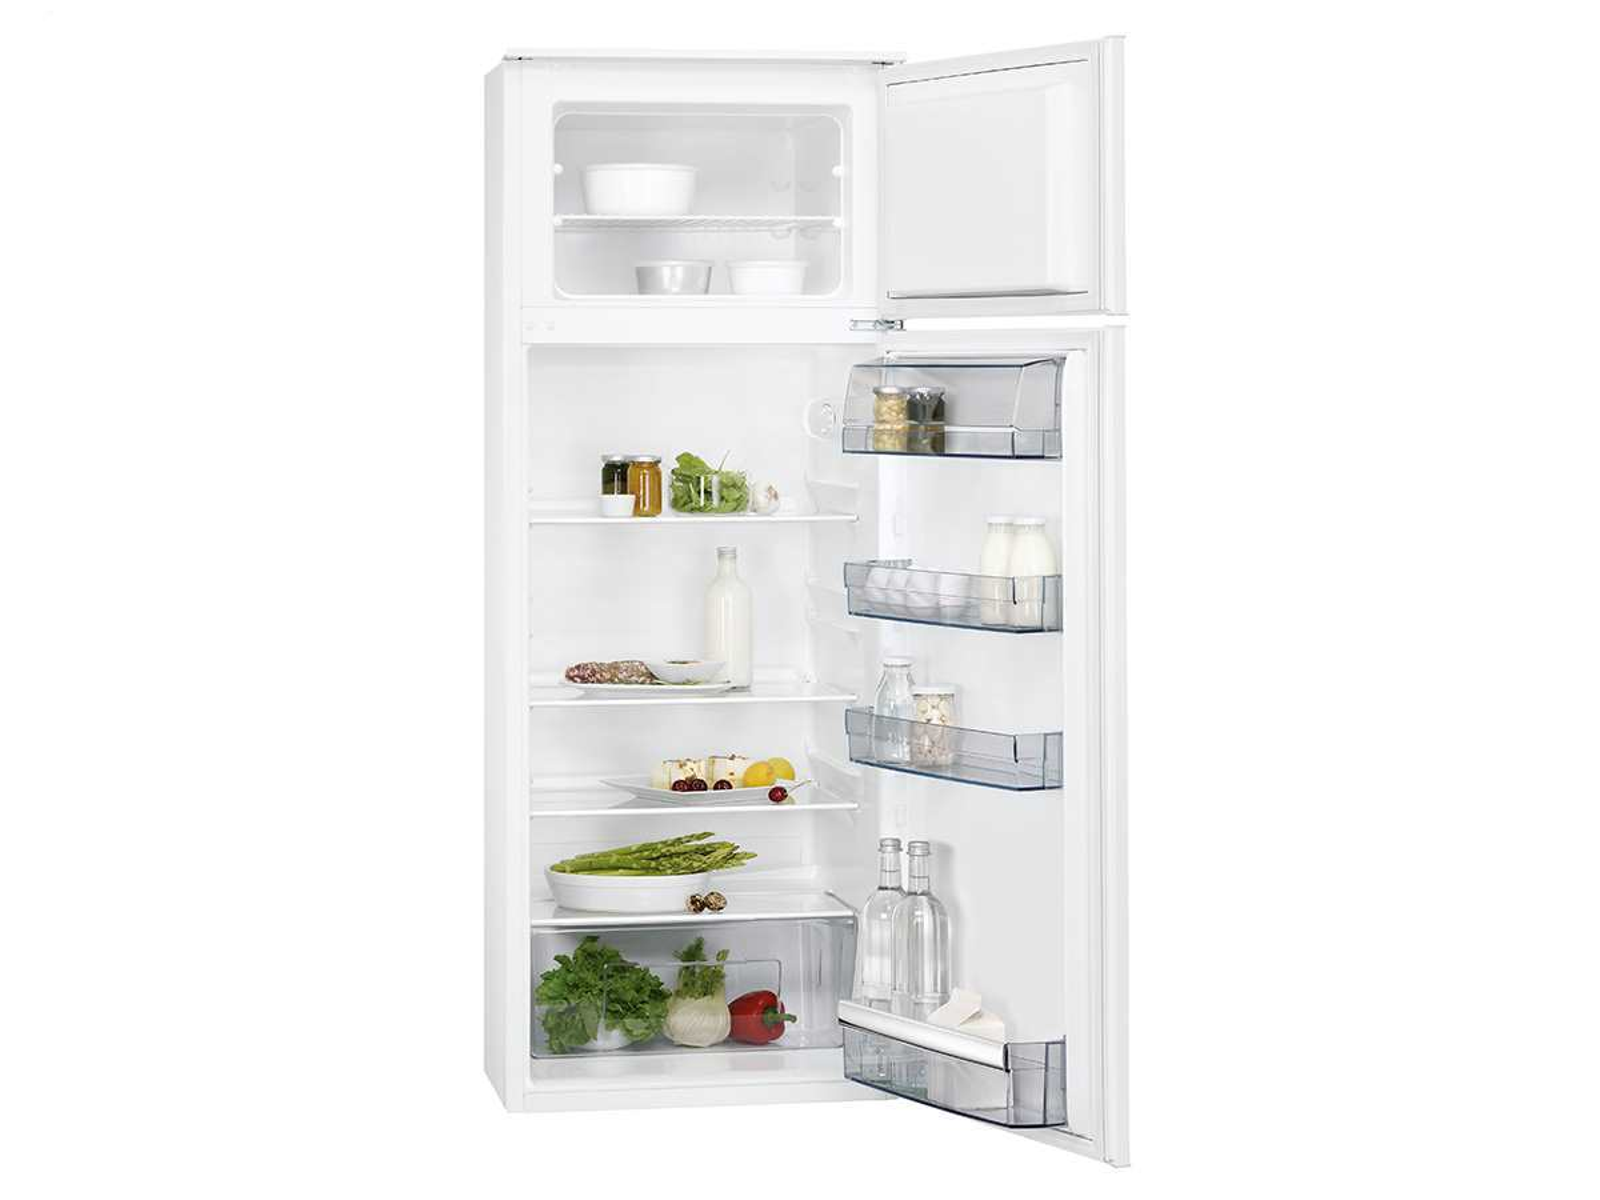 Aeg Kühlschrank Gefrierkombination : Aeg sdb as einbau kühl gefrierkombination